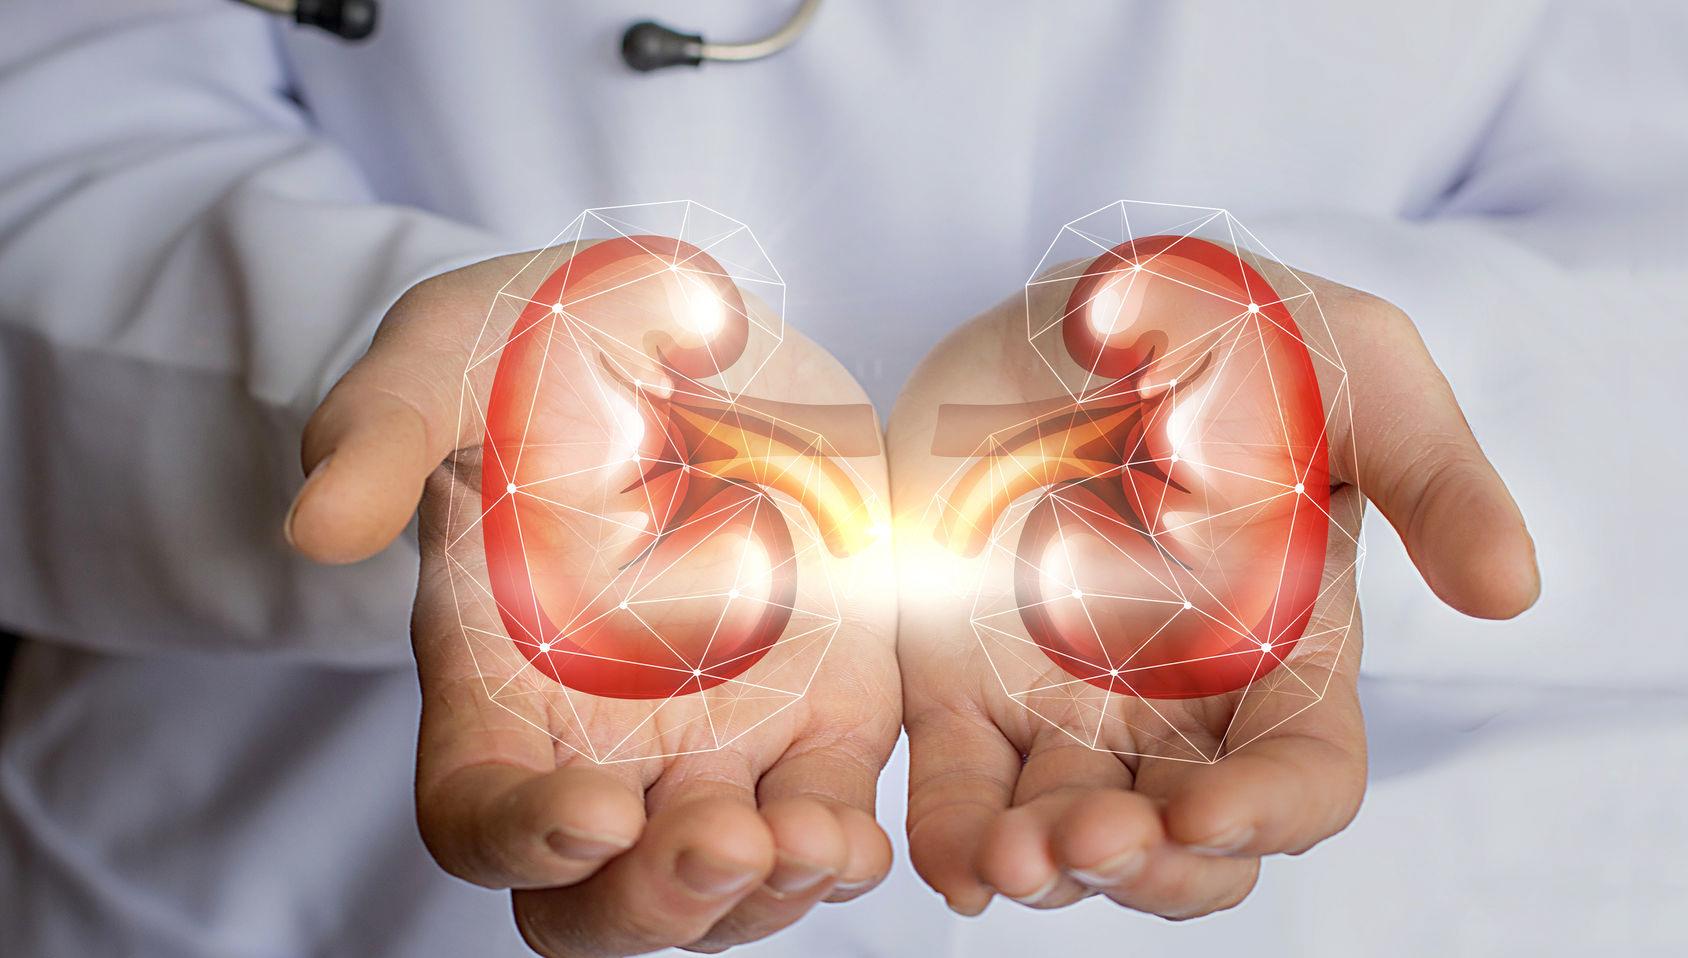 urologo-roma-urologia-a-roma-visita-urologica-i-salus